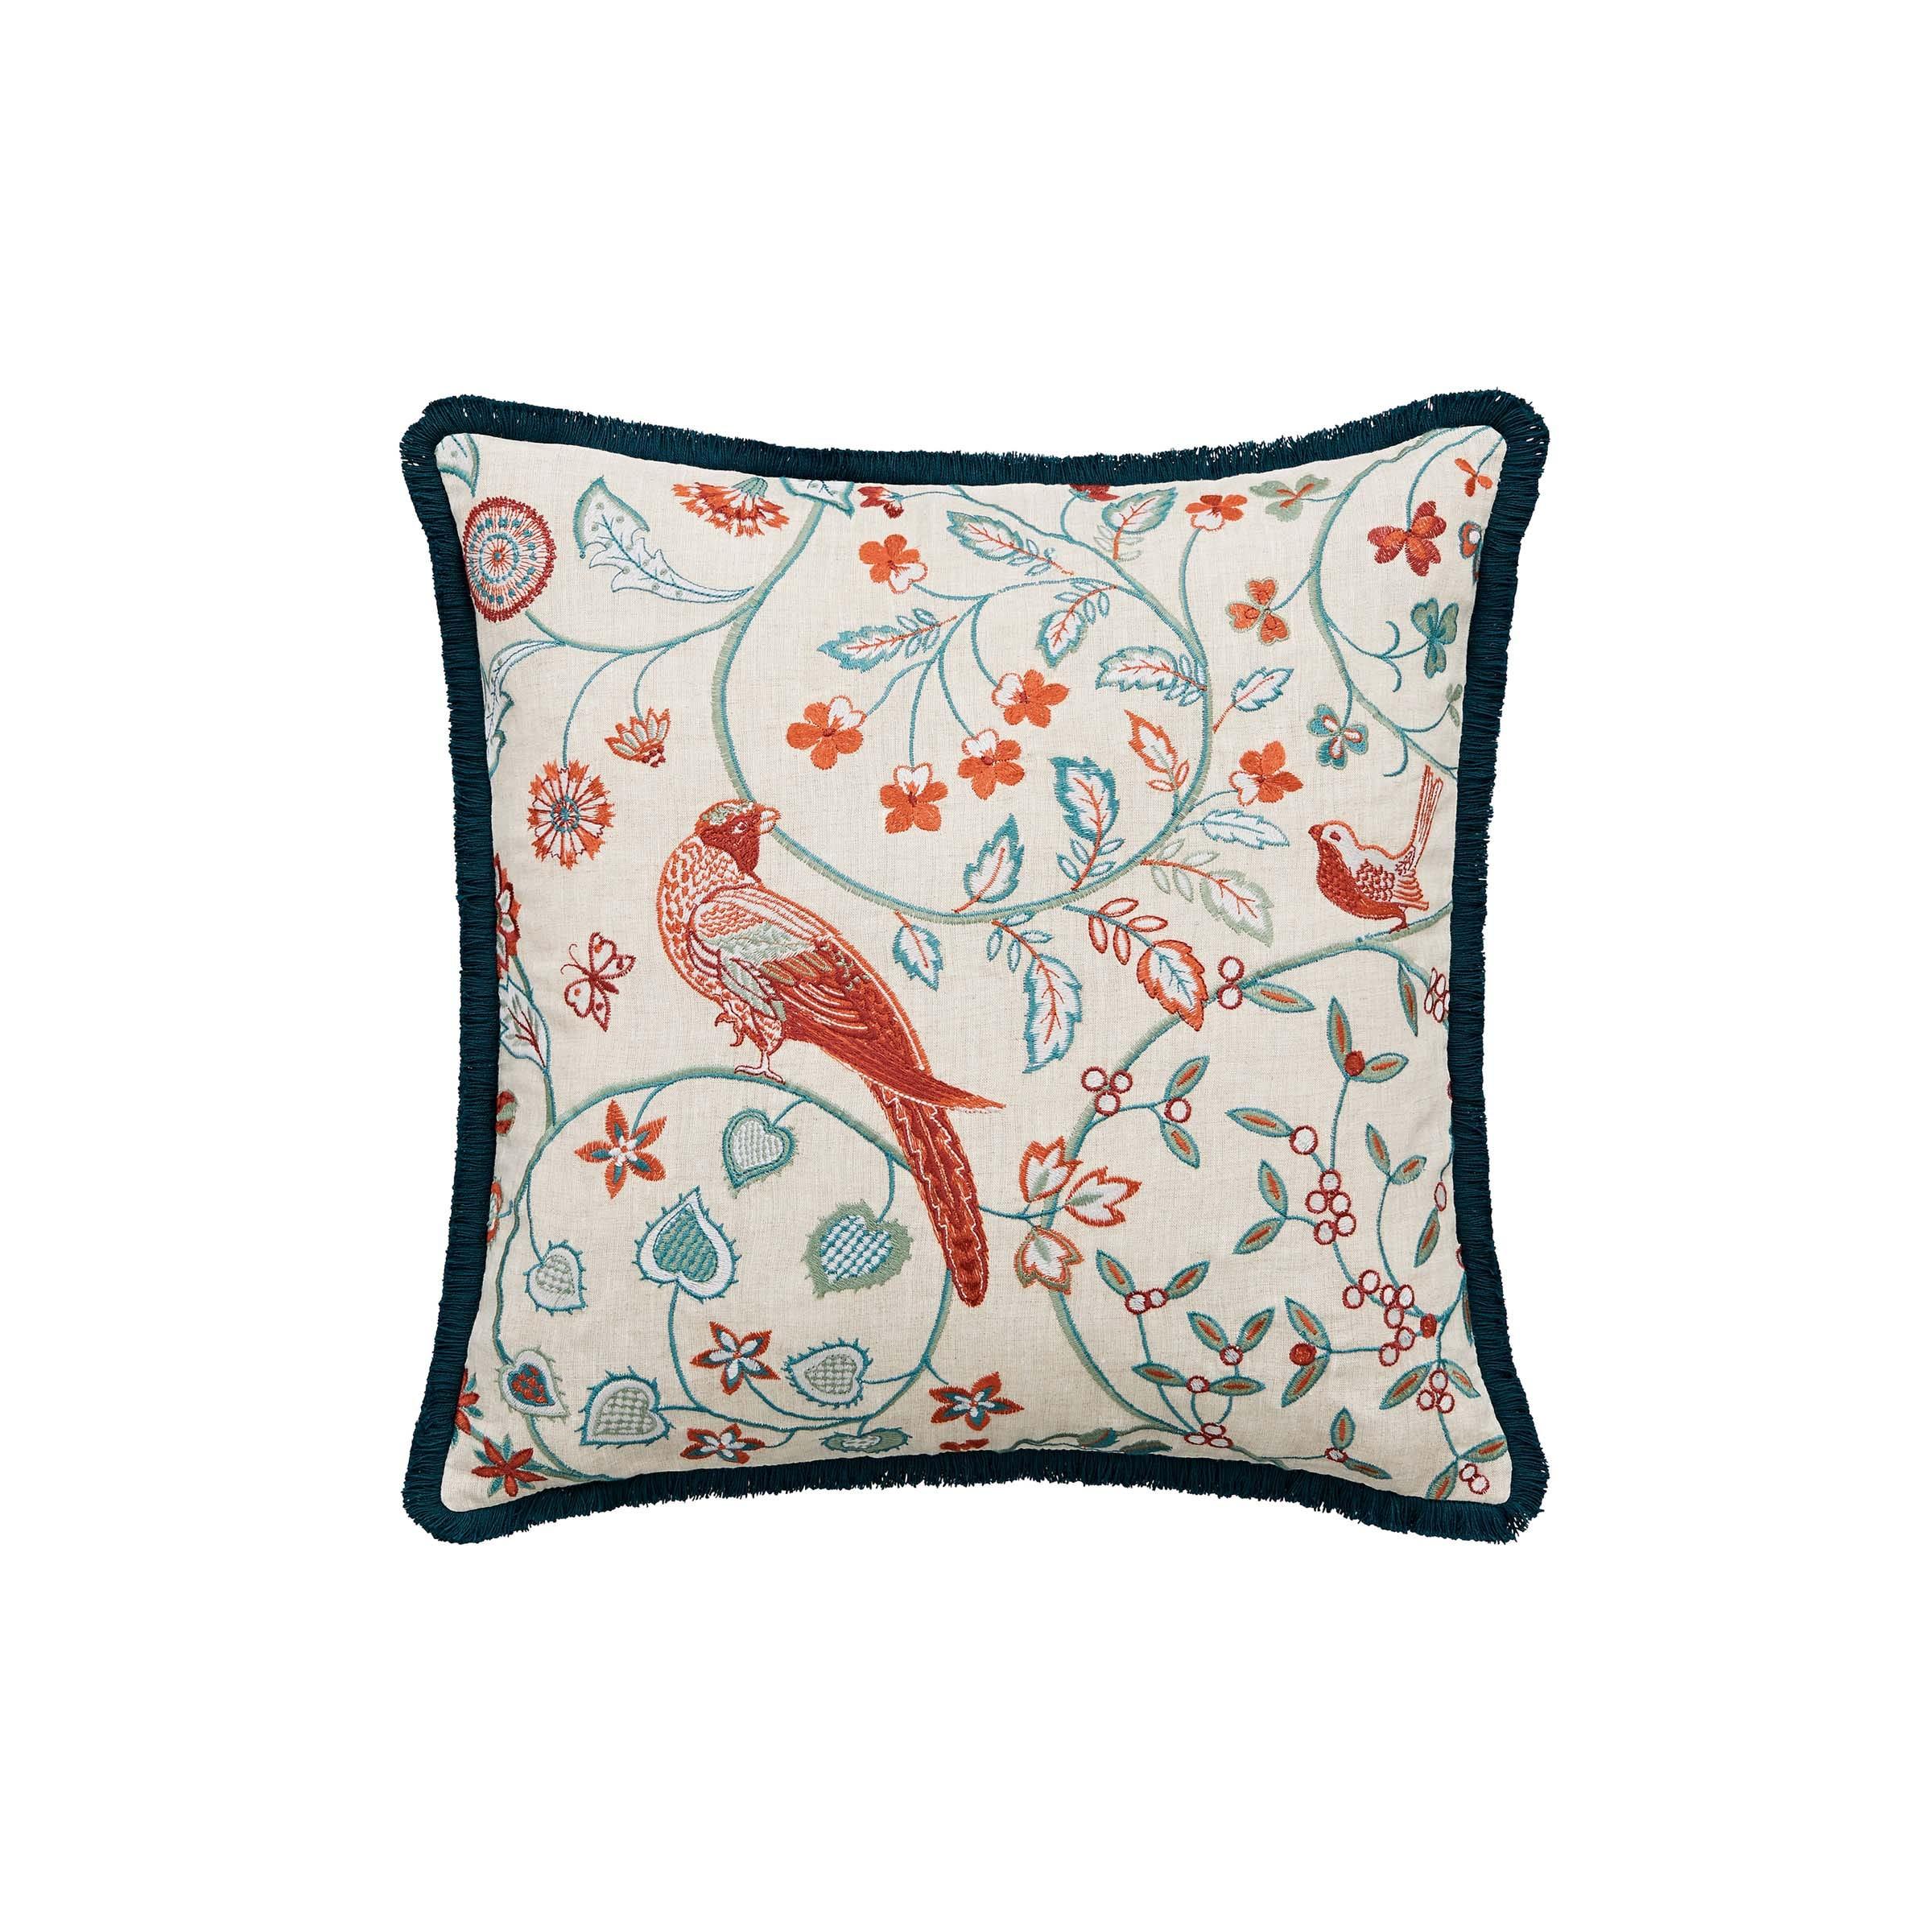 William Morris Sunflower Cushion 45cm x 45cm, Saffron & Teal